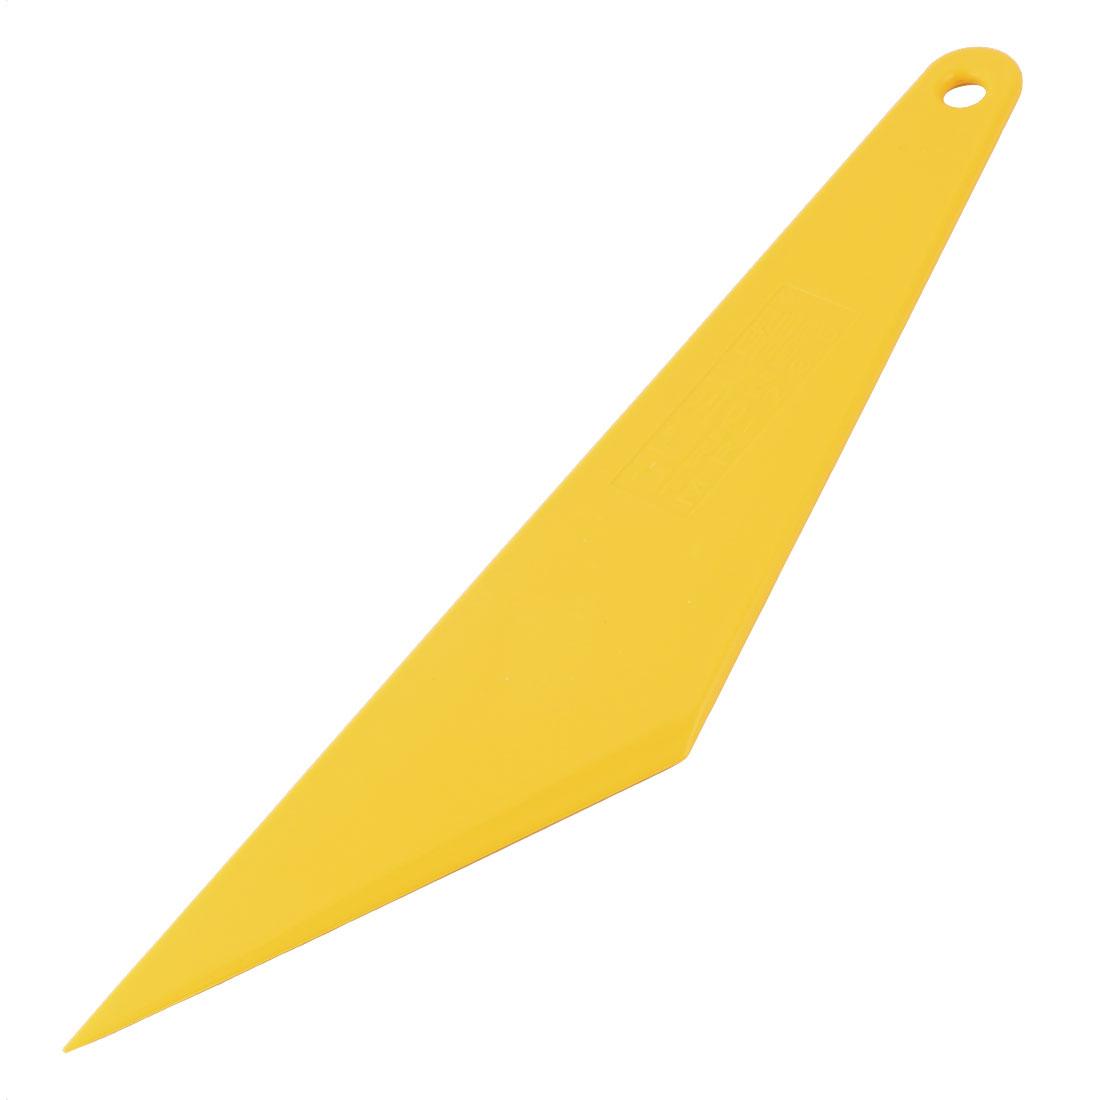 Auto Window Film Sheet Wrap Tint Triangle Cleaning Scraper Yellow 28.5 x 6.2 x 0.5cm